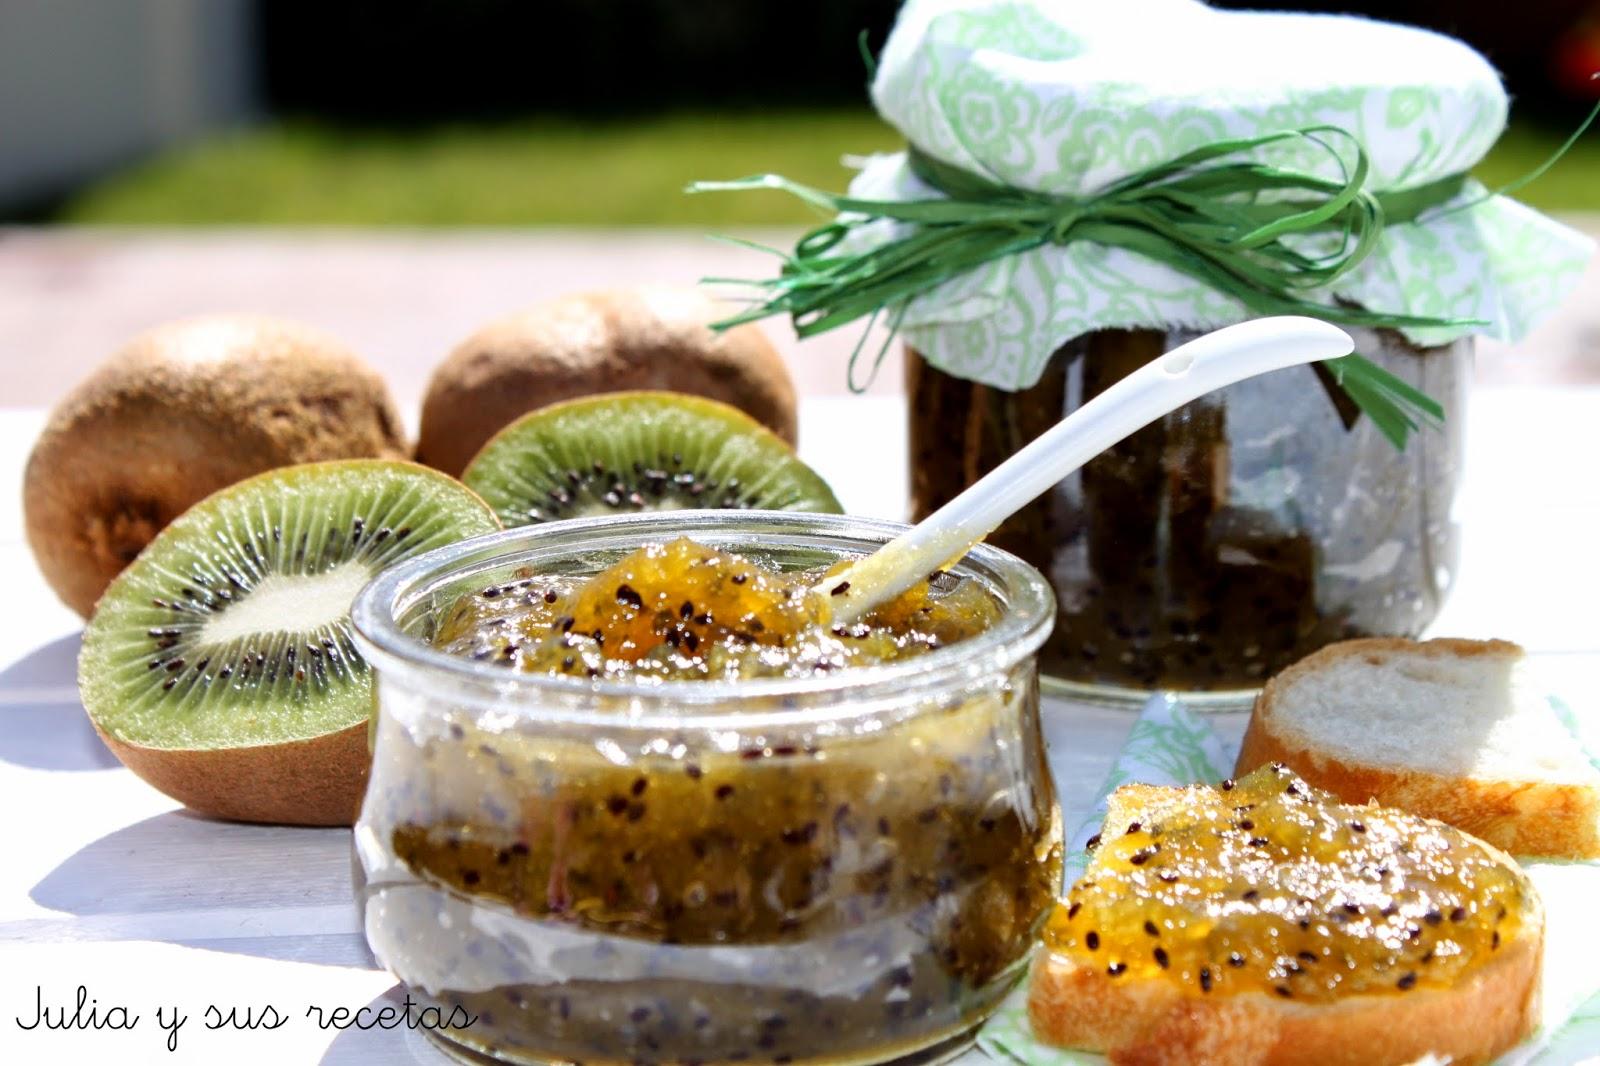 Mermelada de kiwi. Julia y sus recetas